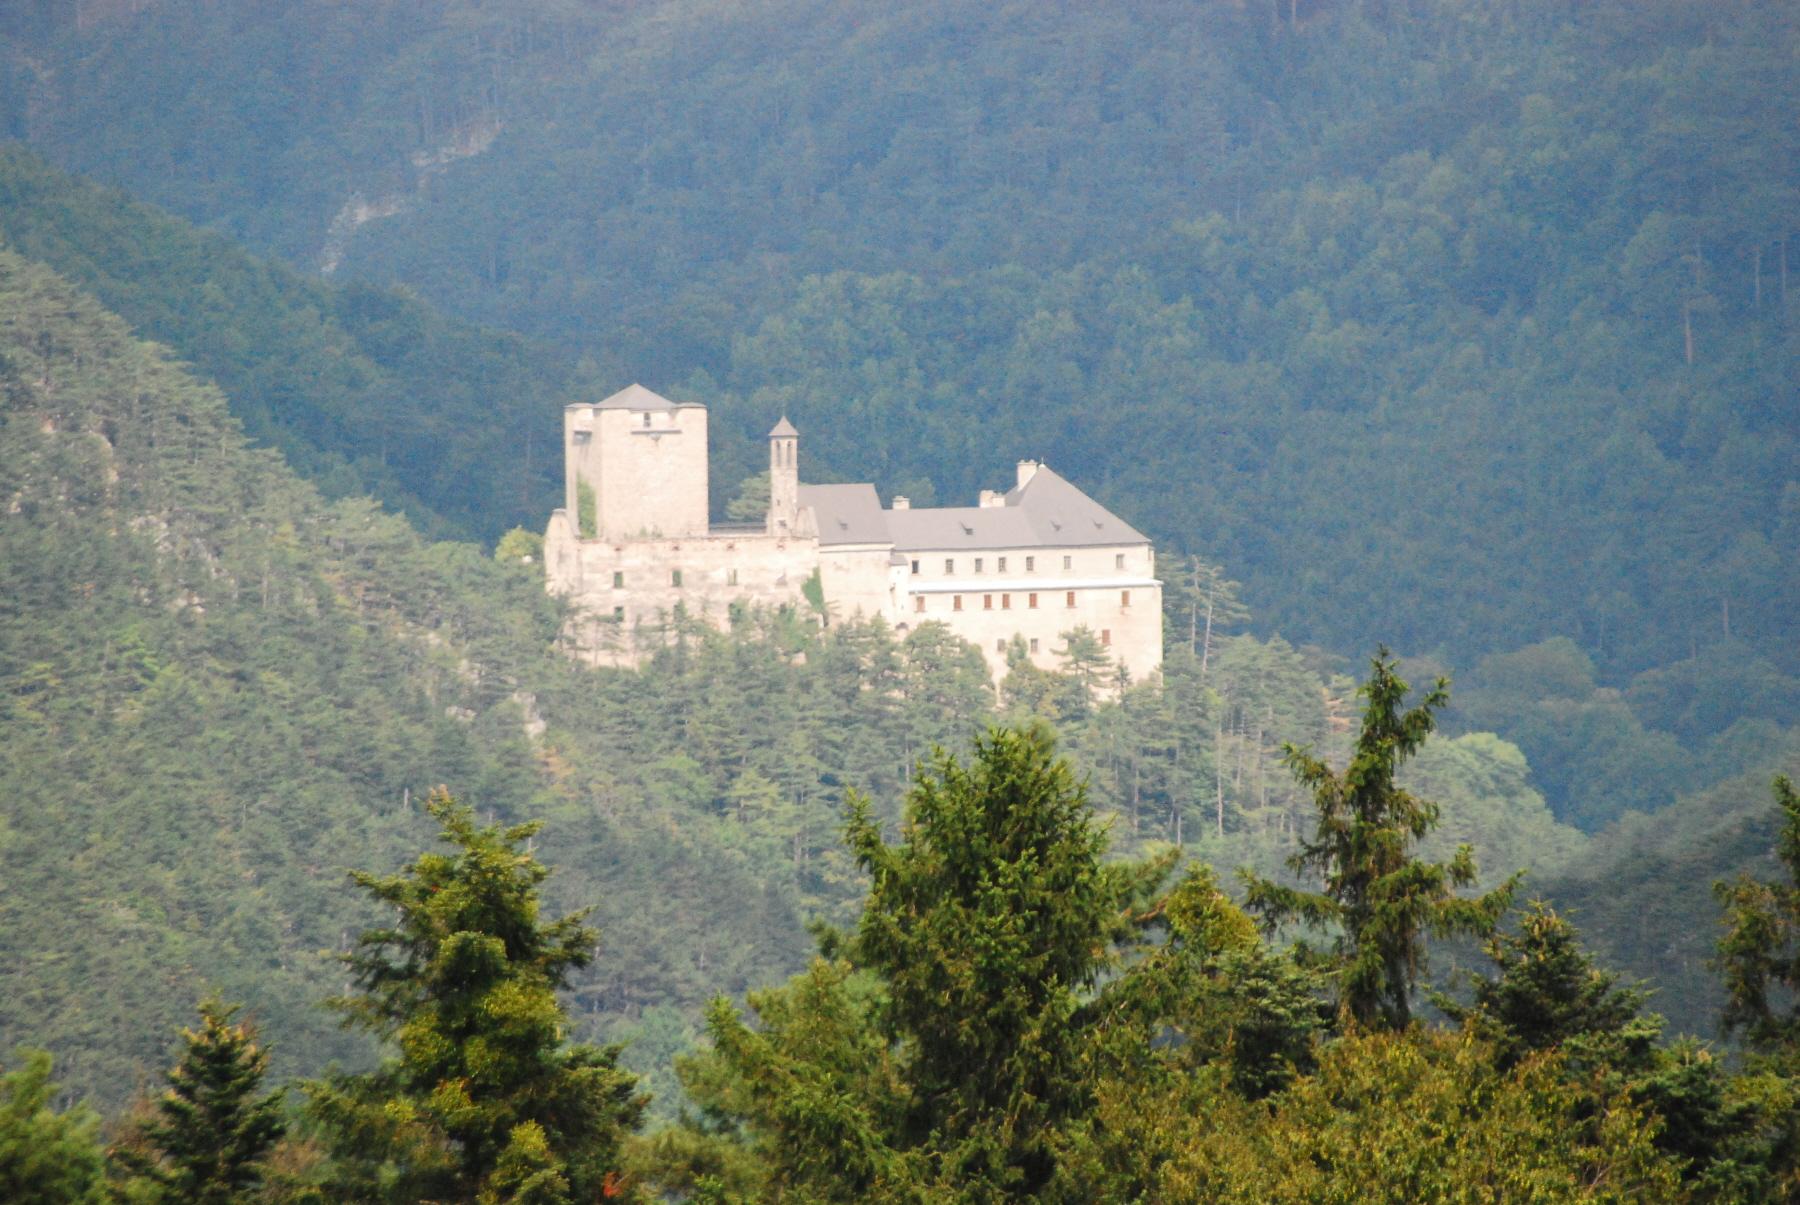 https://upload.wikimedia.org/wikipedia/commons/c/c5/GuentherZ_2010-08-14_0080_Buerg-Sieding_Schloss_Stixenstein.jpg